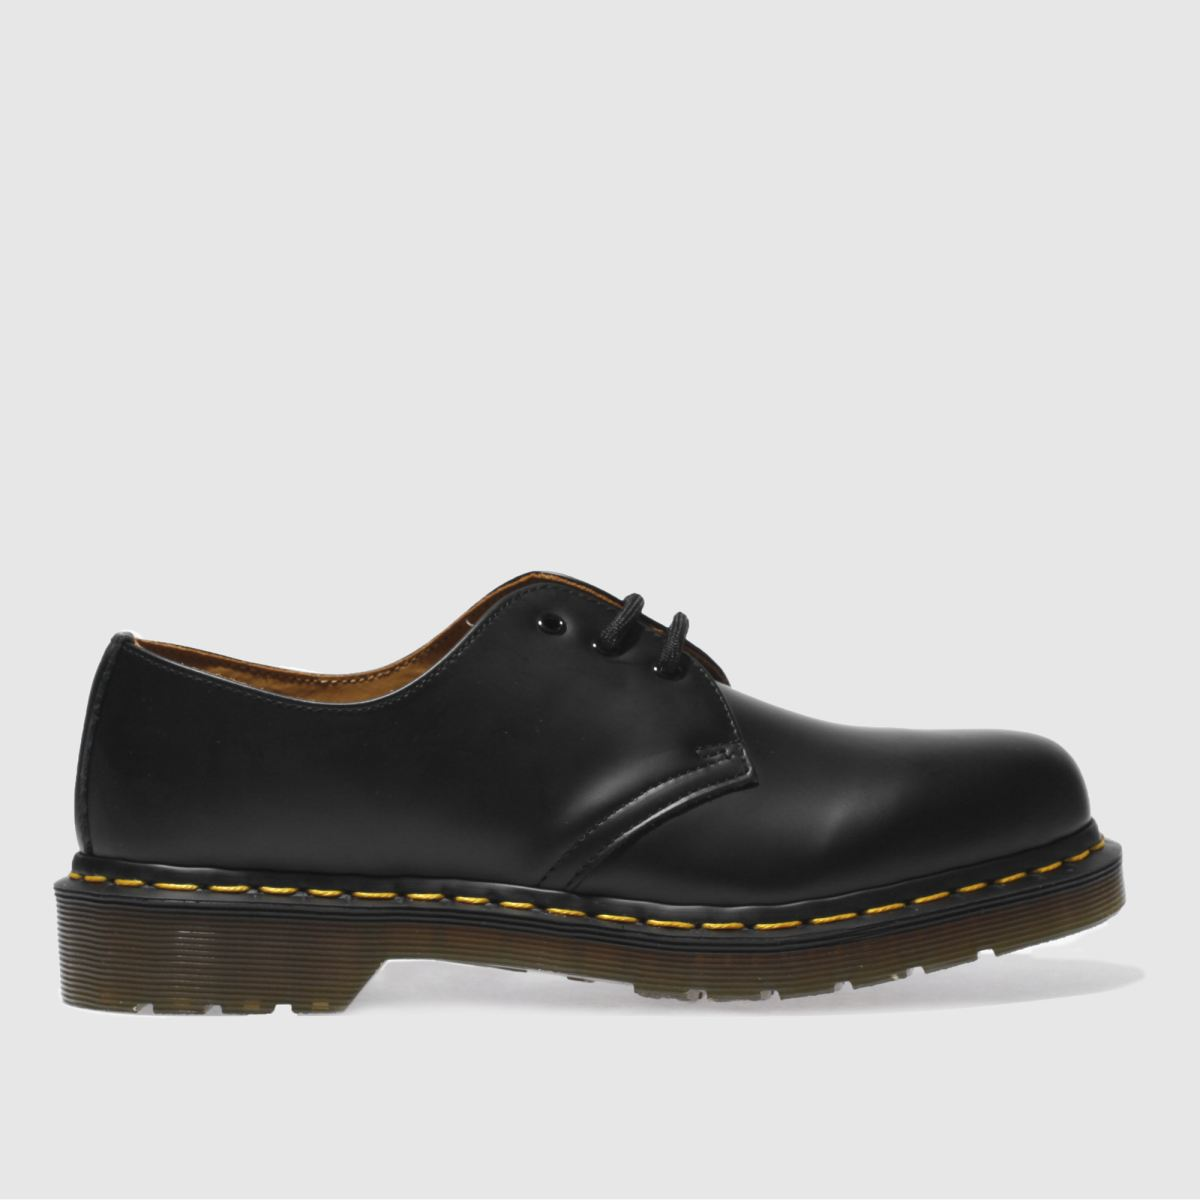 Cheap Womens Flat Shoes Uk